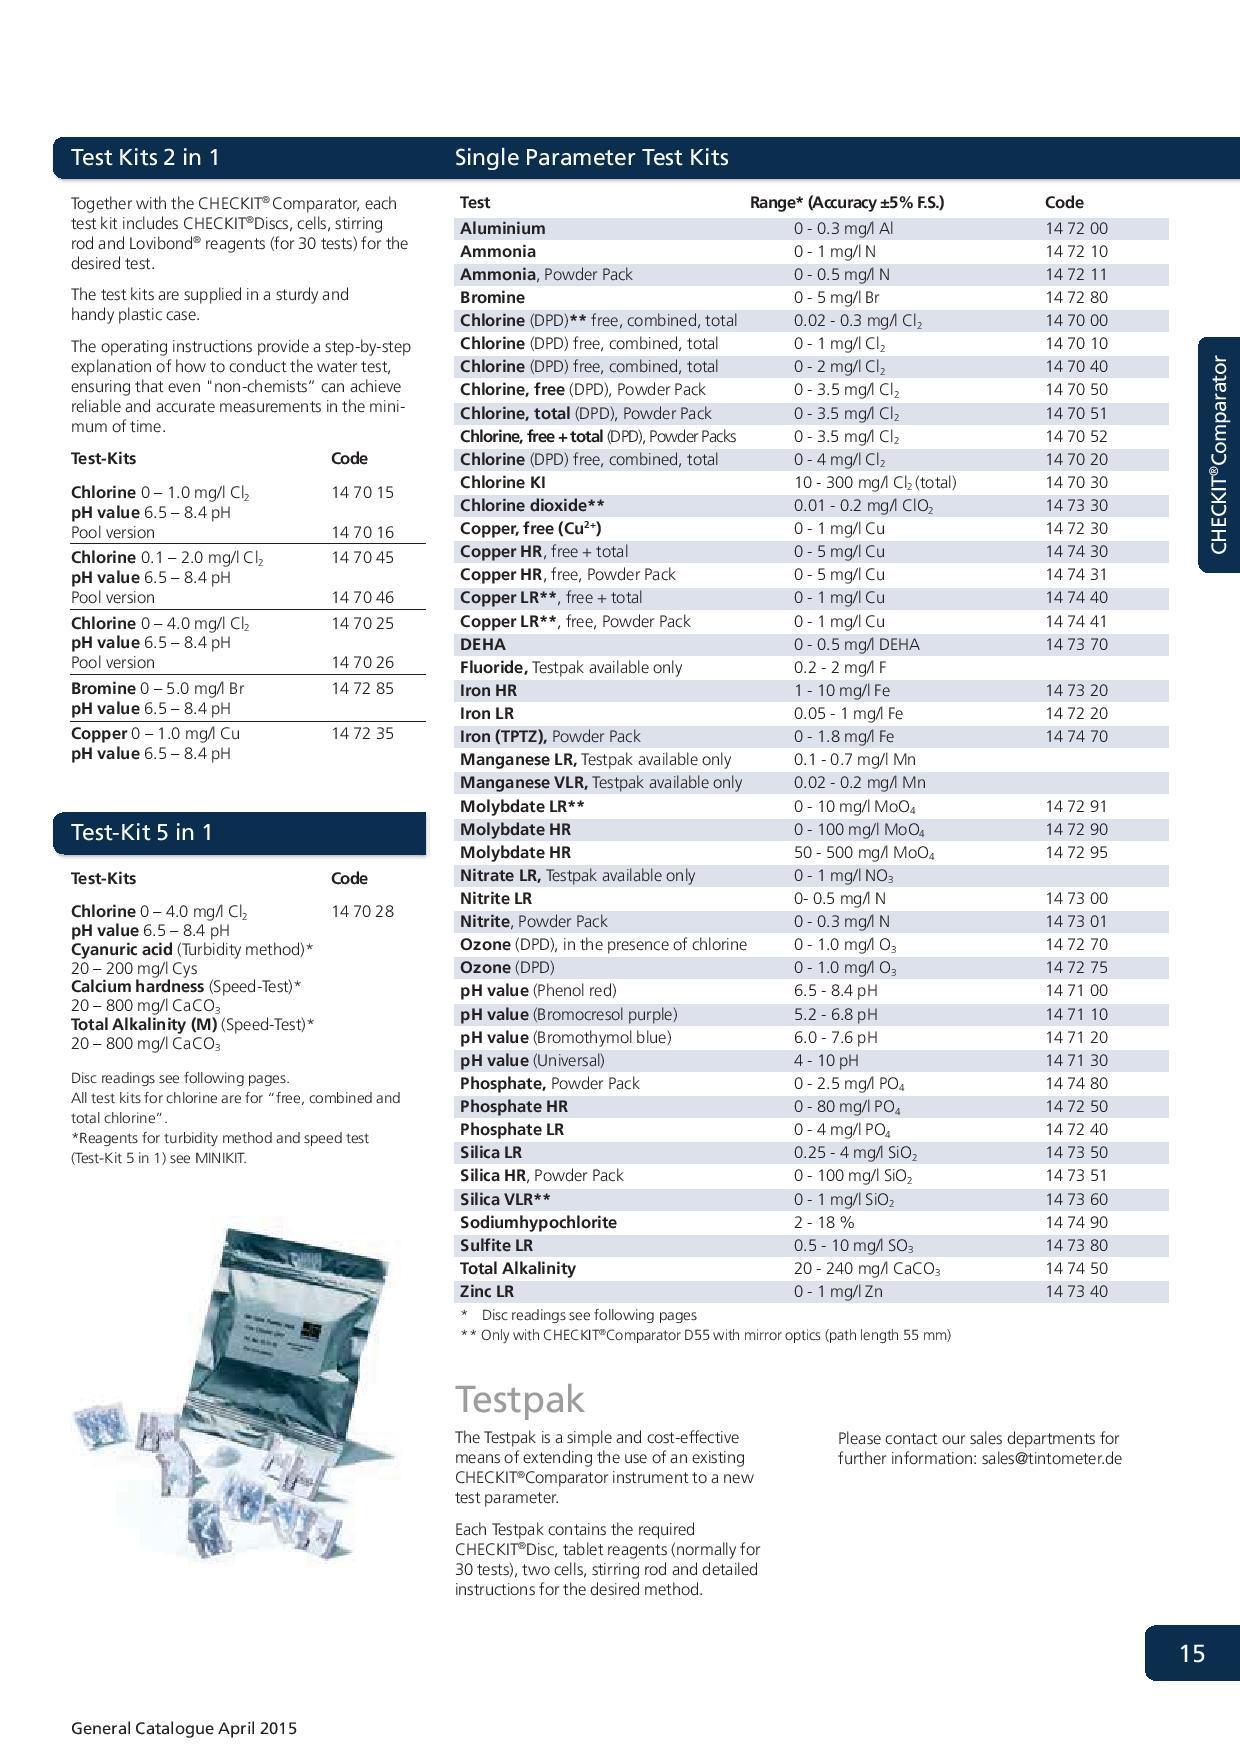 Lovibond Checkit Comparator